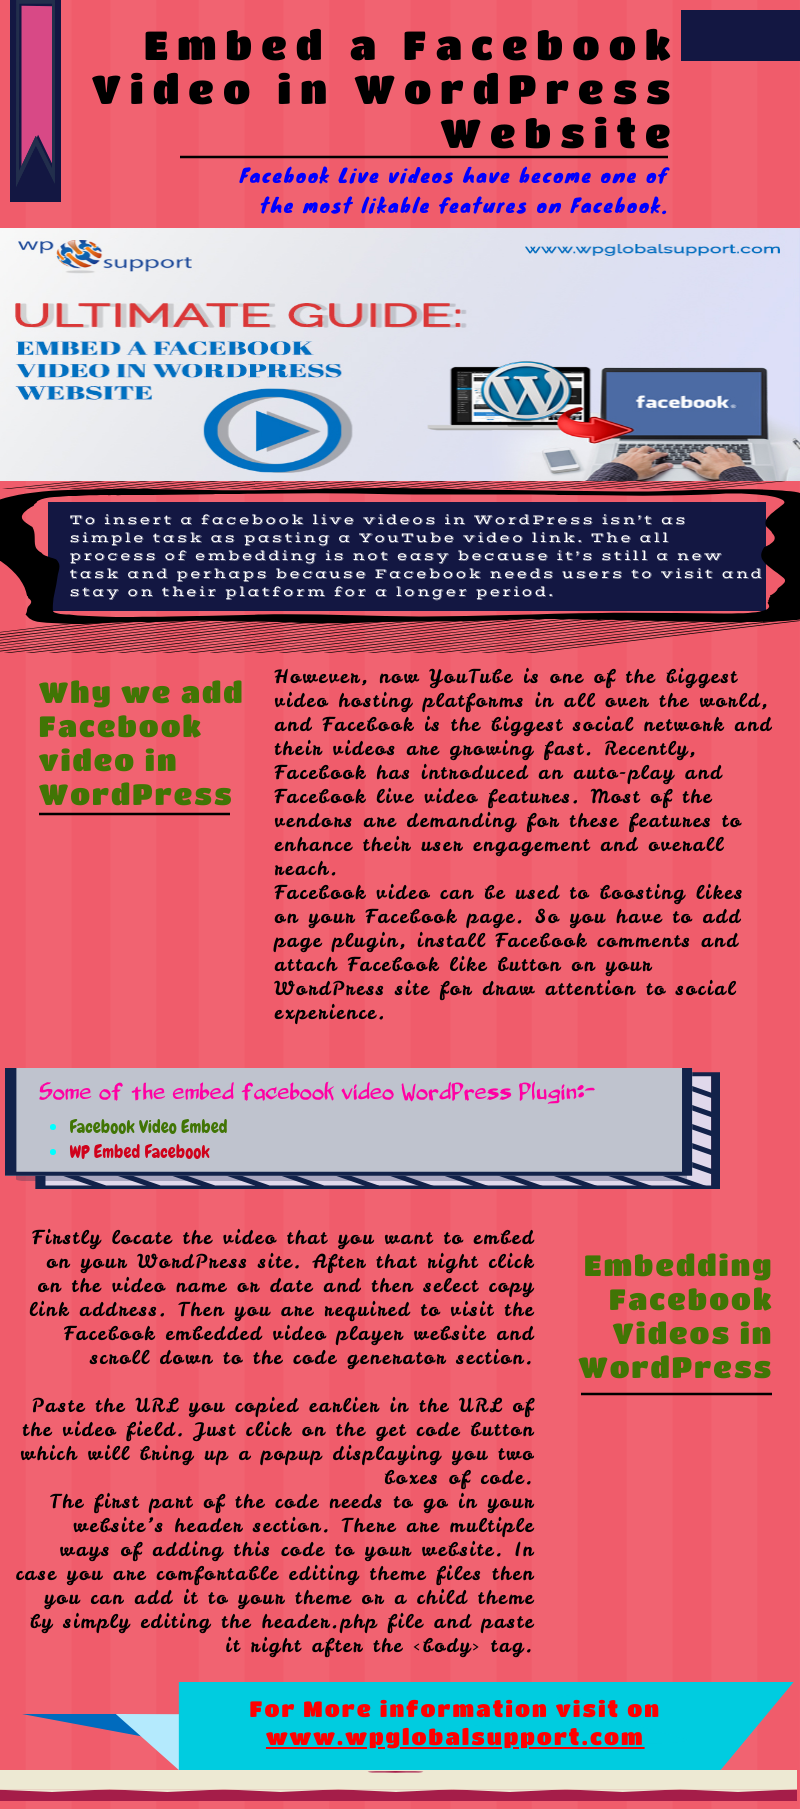 Ultimate Guide: Embed a Facebook Video in WordPress Website